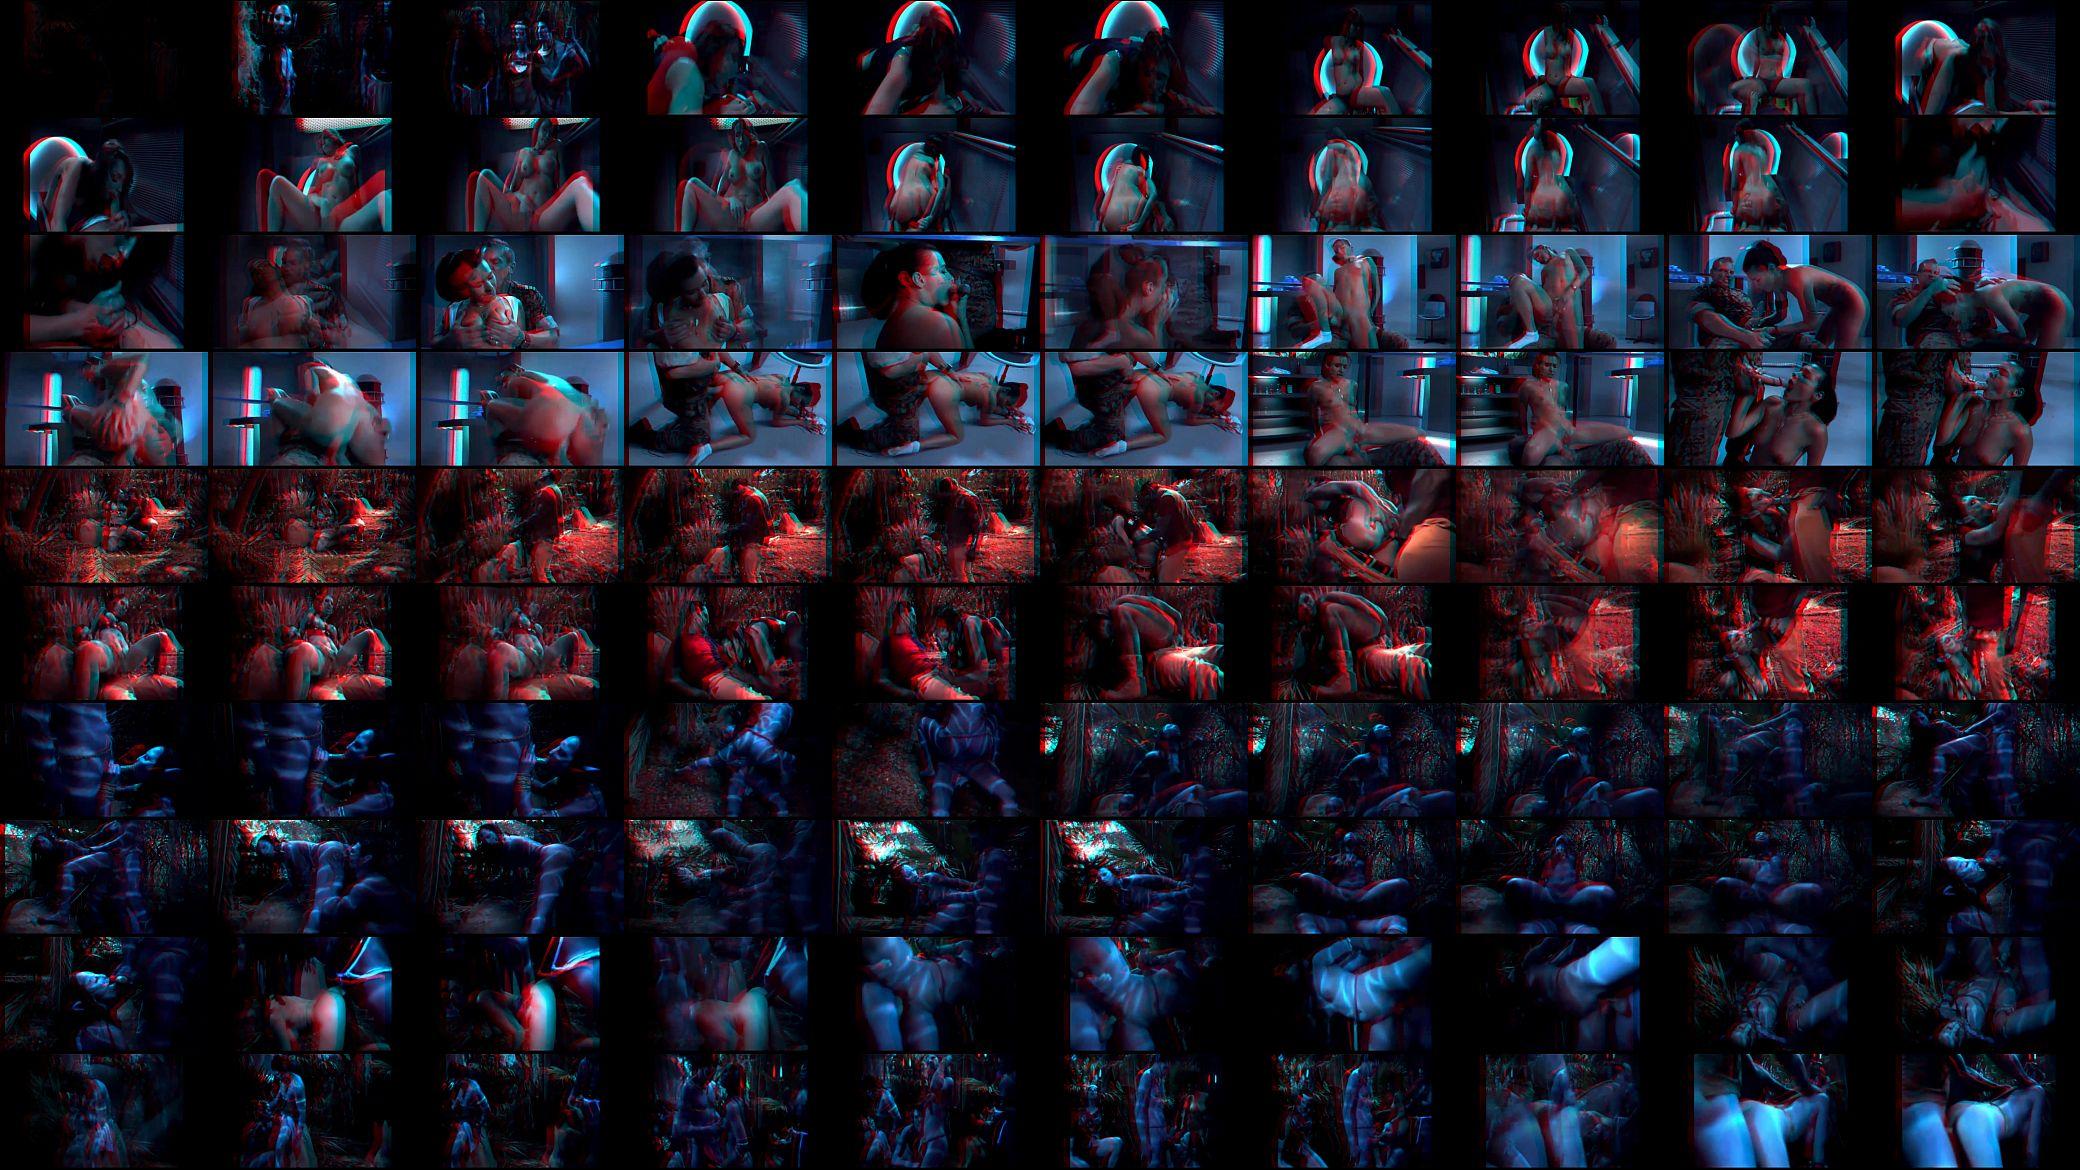 Avatar Porno Pelicula avatar xxx porn video 3d - xnxx